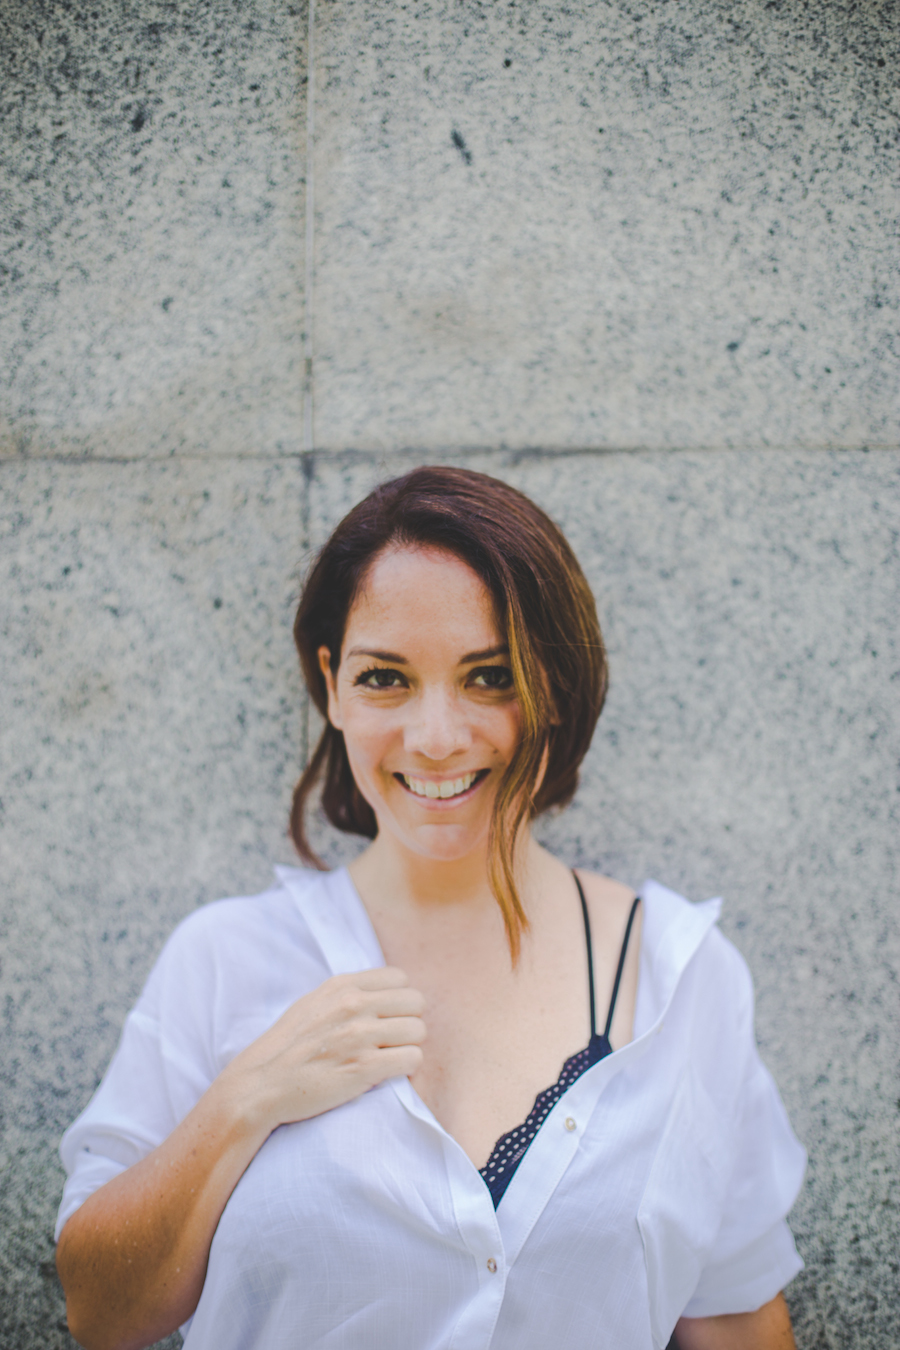 Tendencia Bralette . Cómo usar un bralette how to wear bralette - La Vida de Serendipity